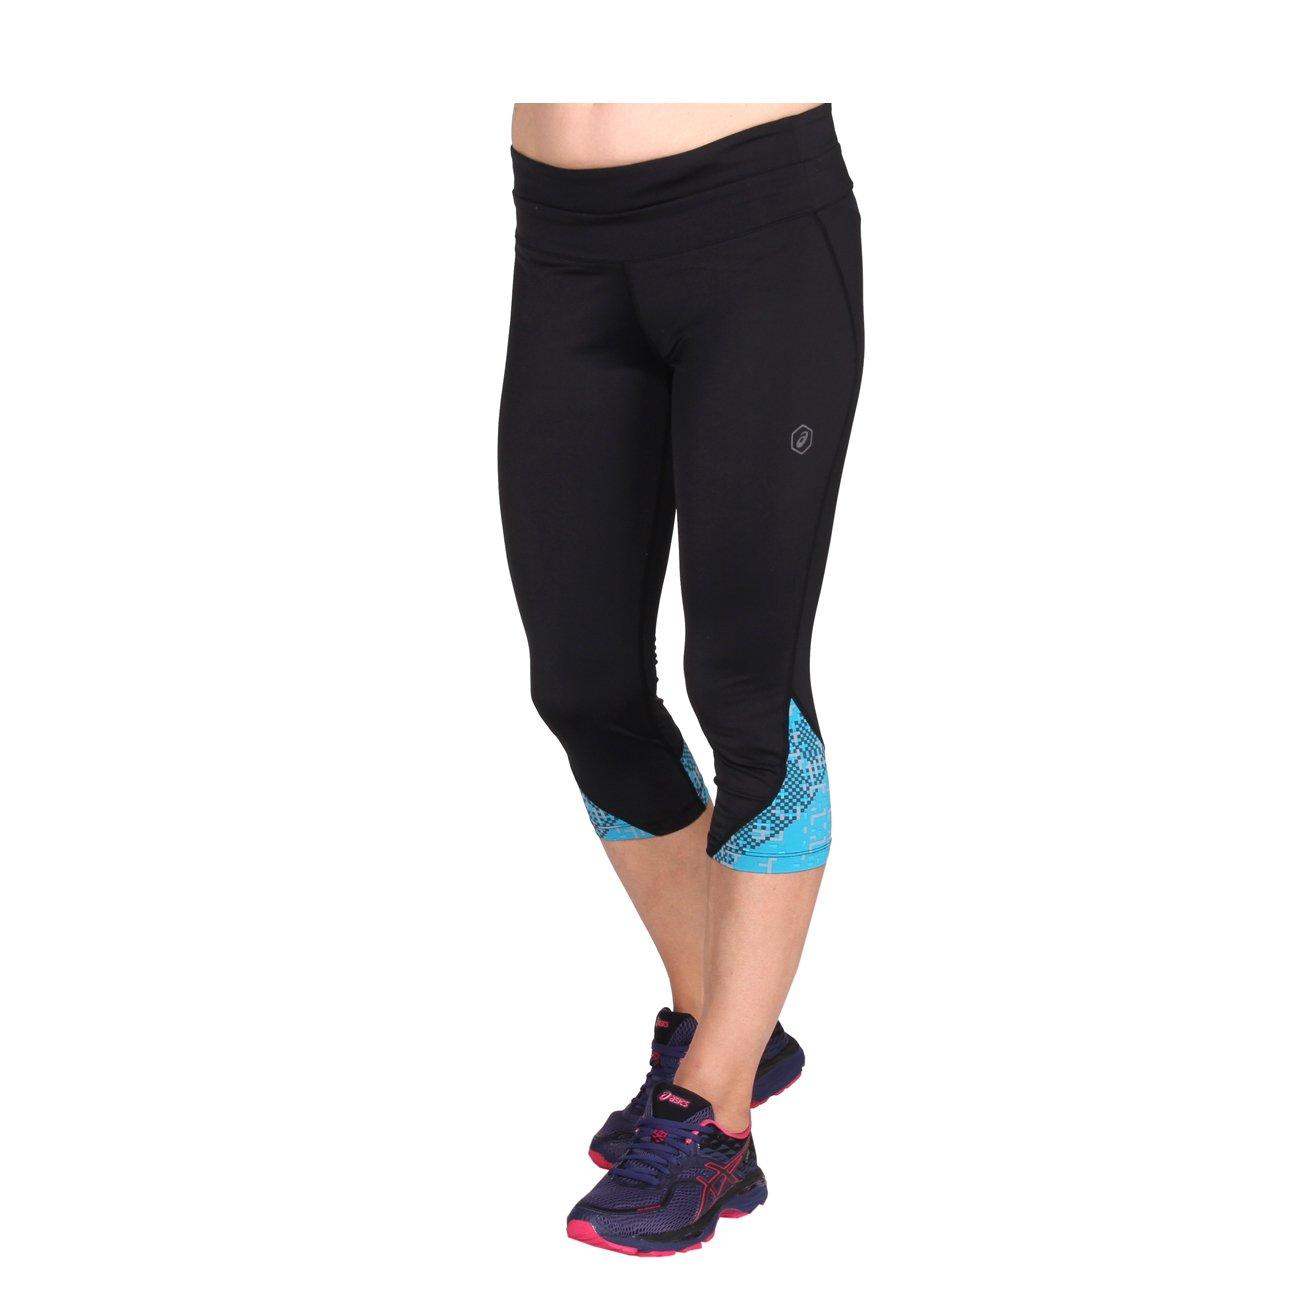 asics sport race knee tight